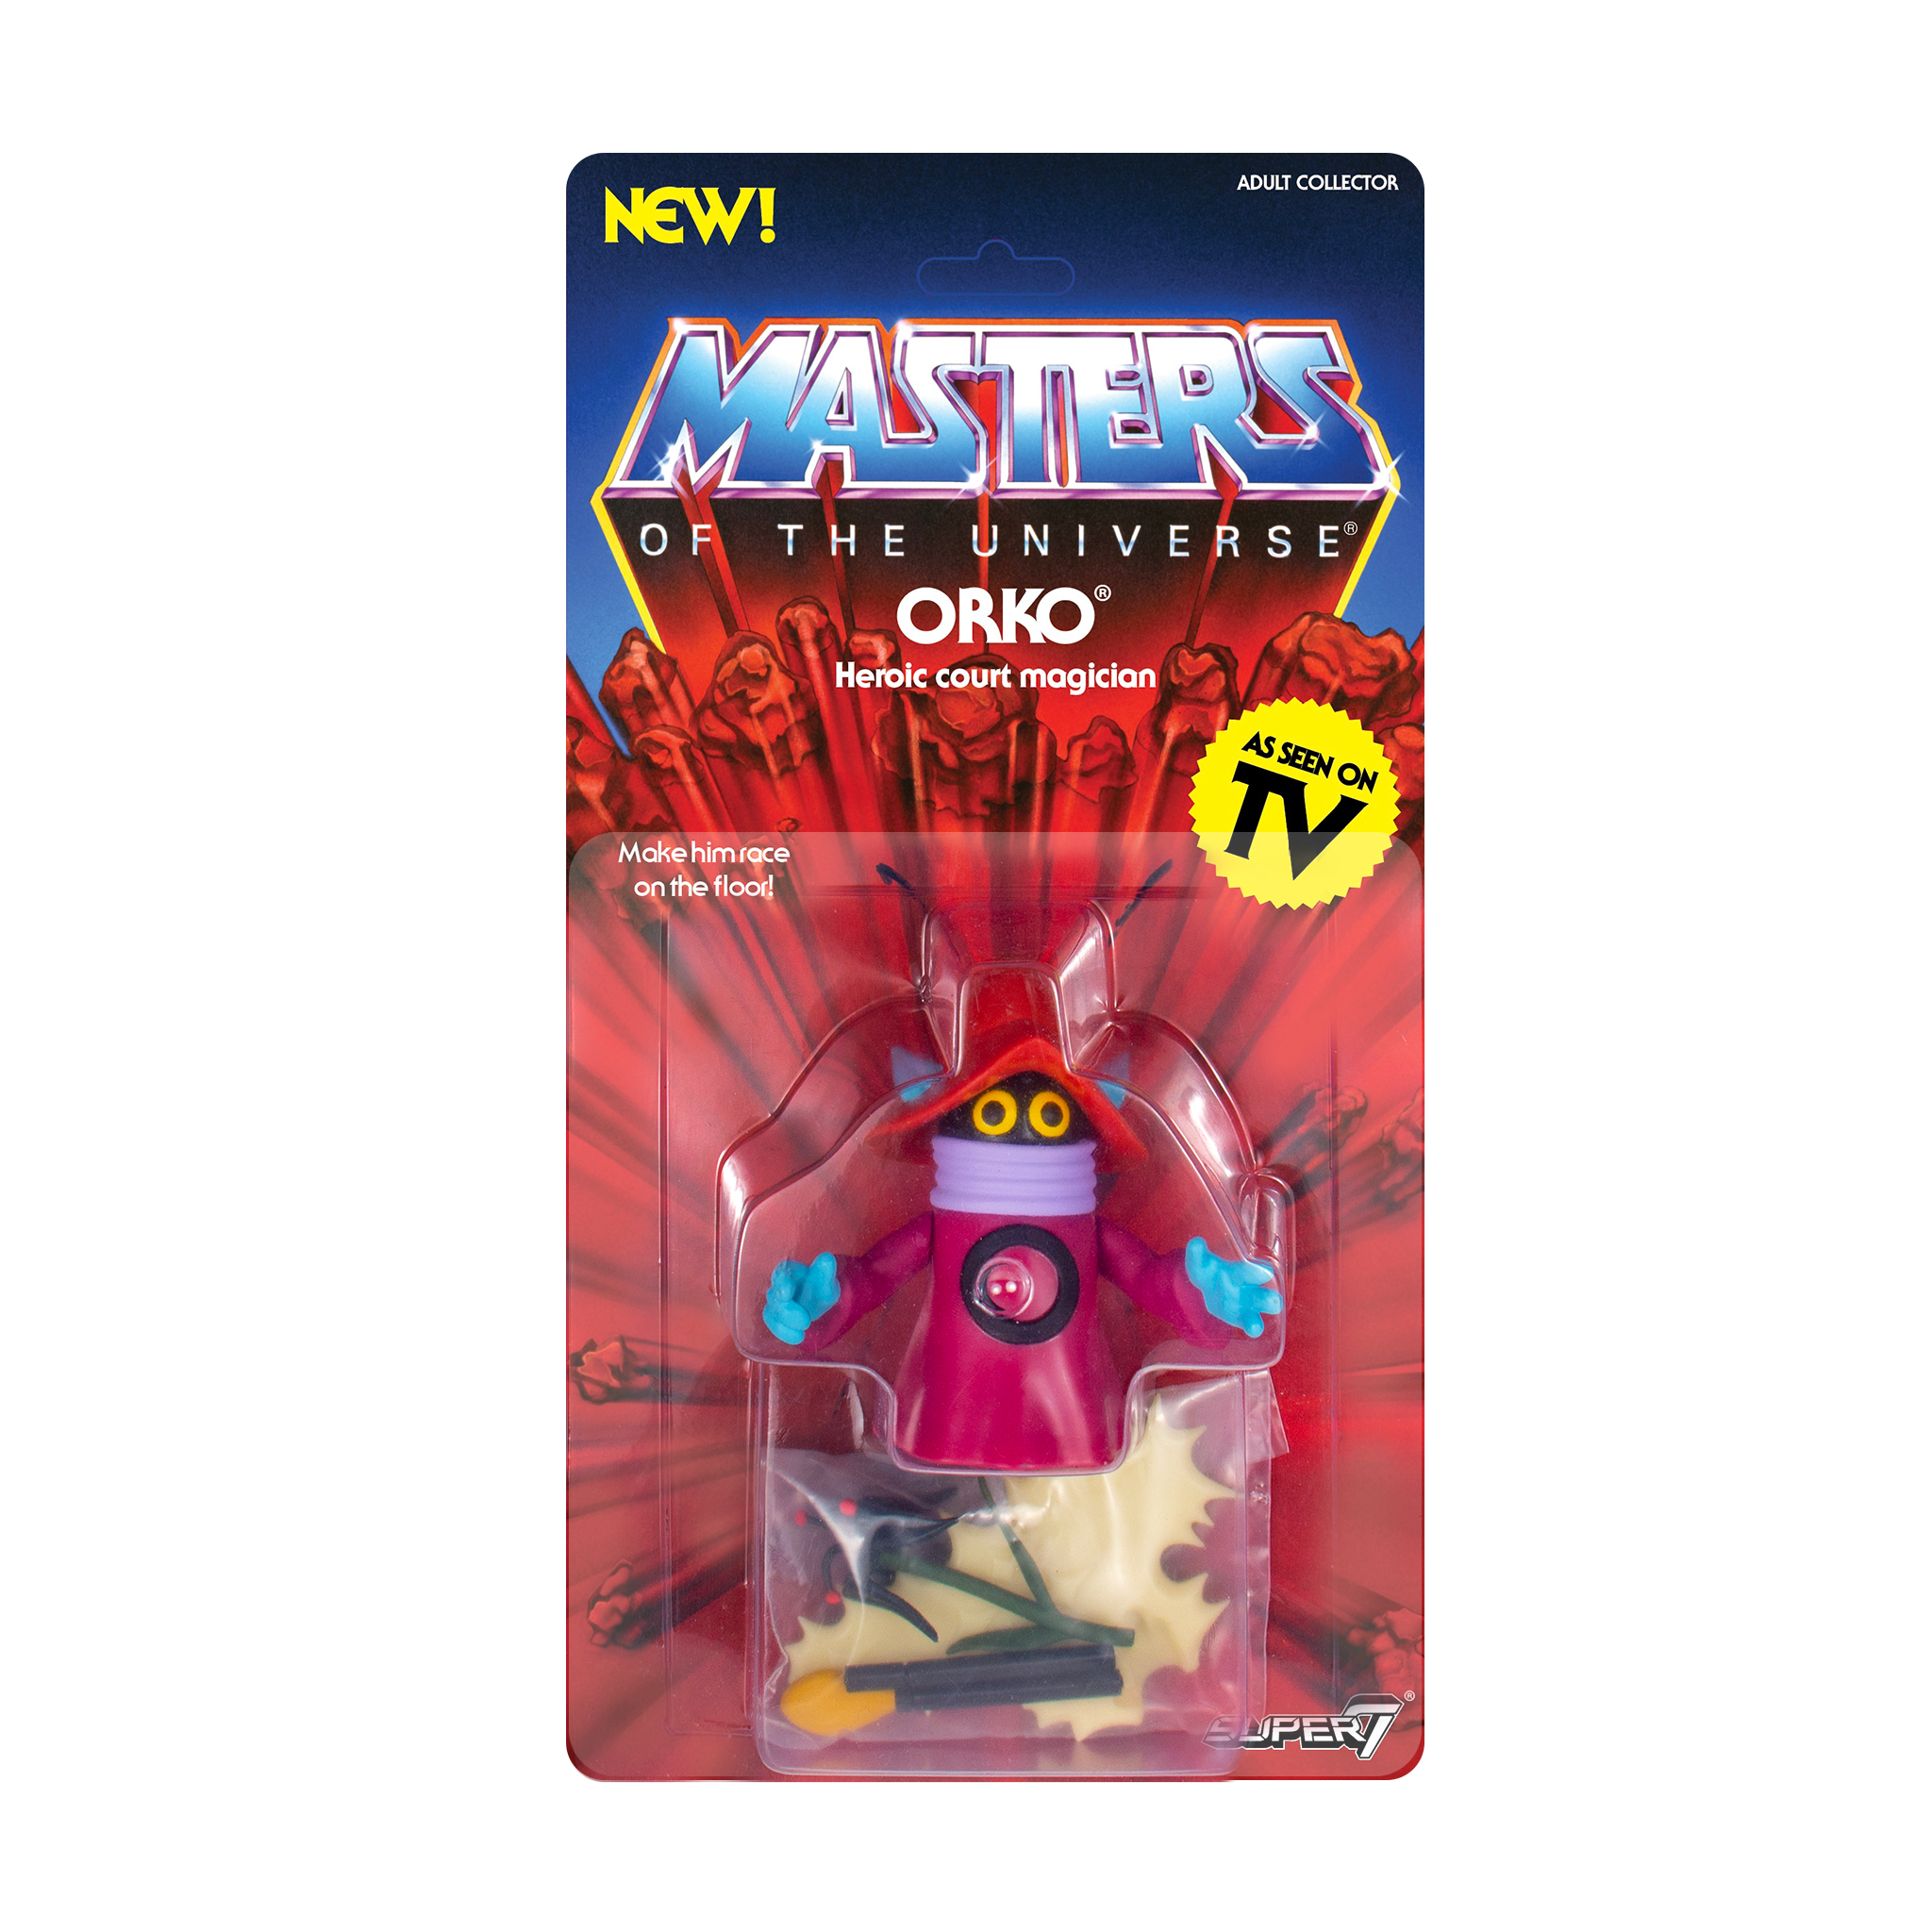 Orko Masters of the Universe, Super 7